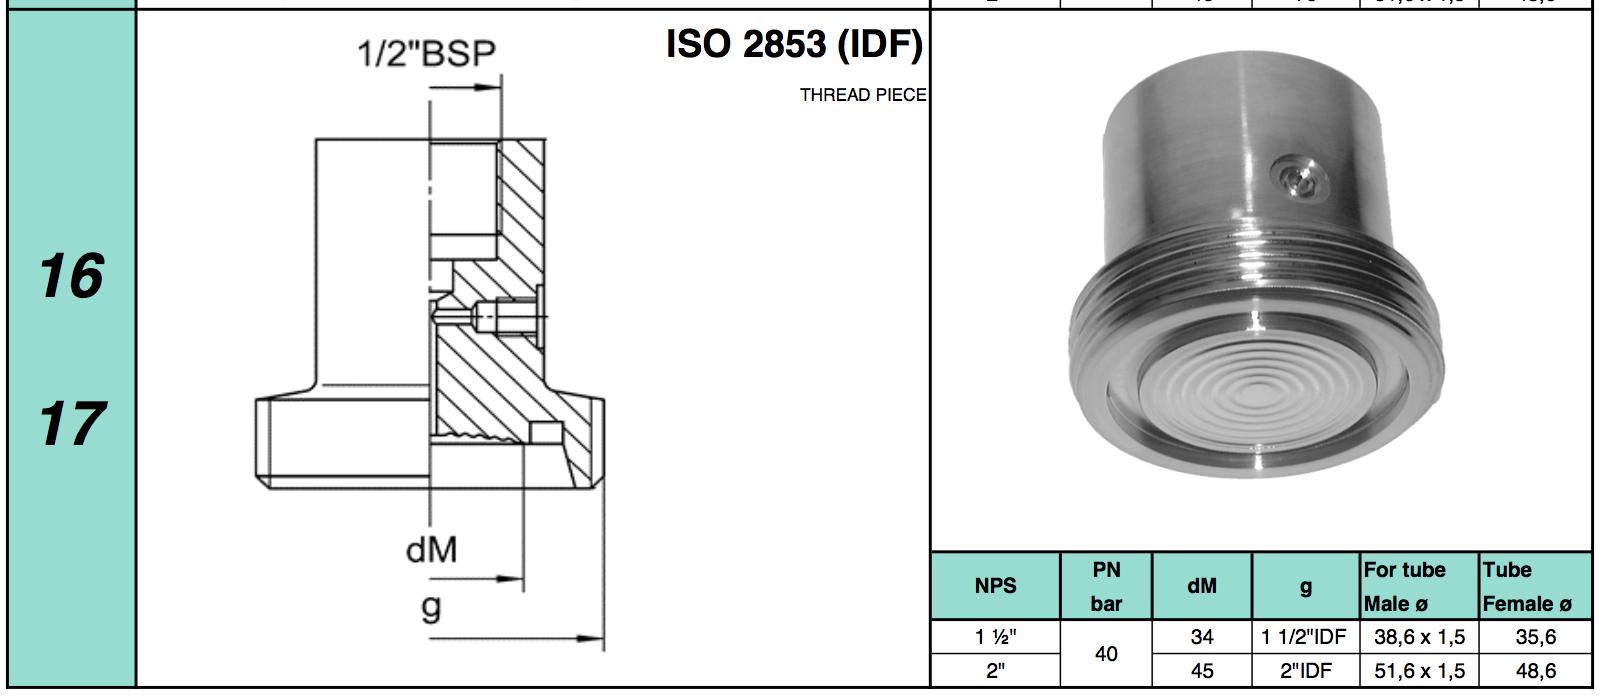 Chuẩn kết nối Diaphragm Seal dạng Thread Piece ISO 2853 ( IDF )